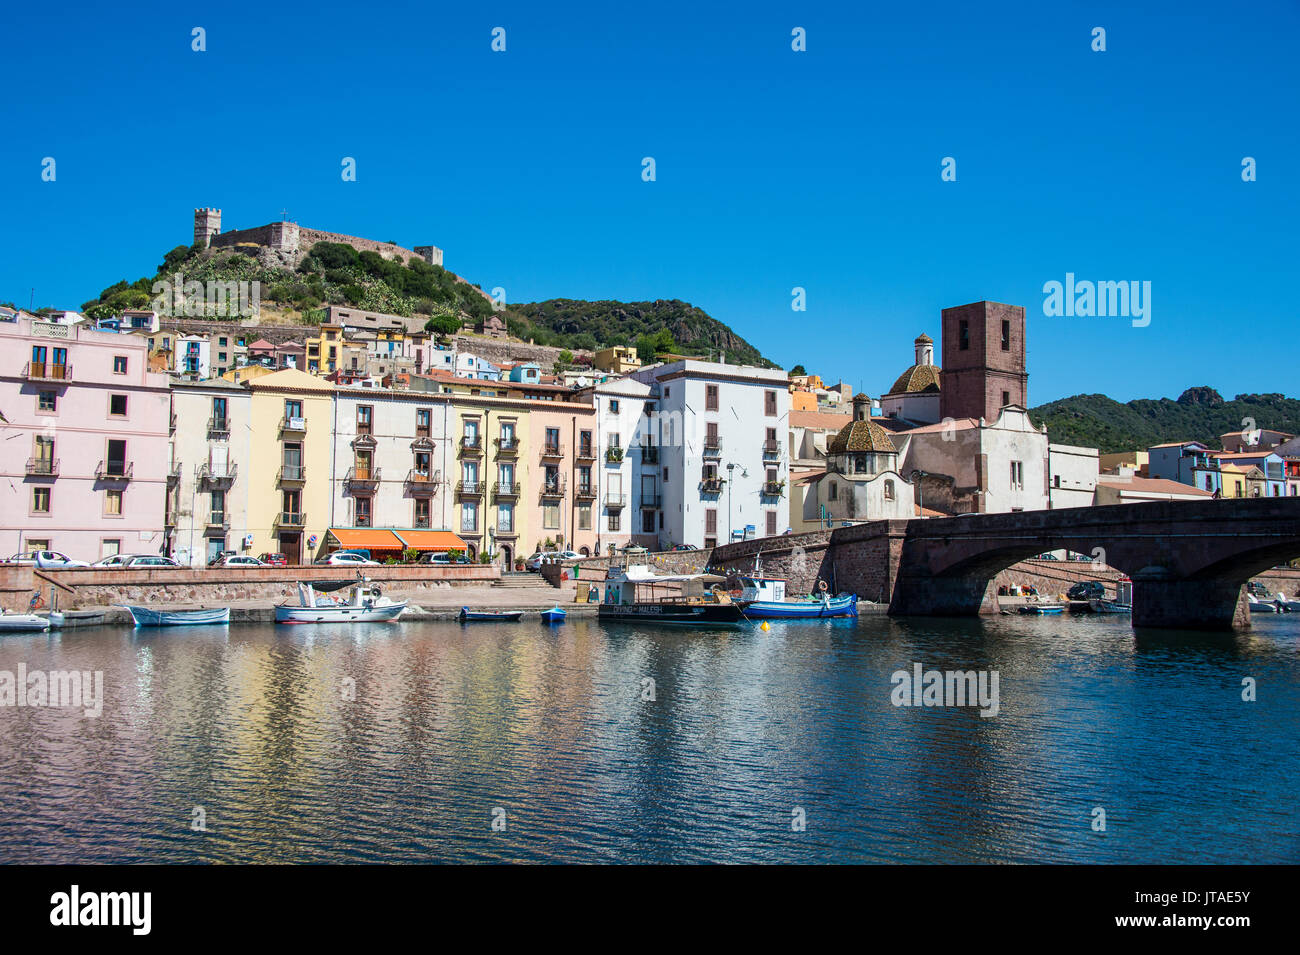 Die Stadt Bosa am Fluss Temo, Sardinien, Italien, Europa Stockbild